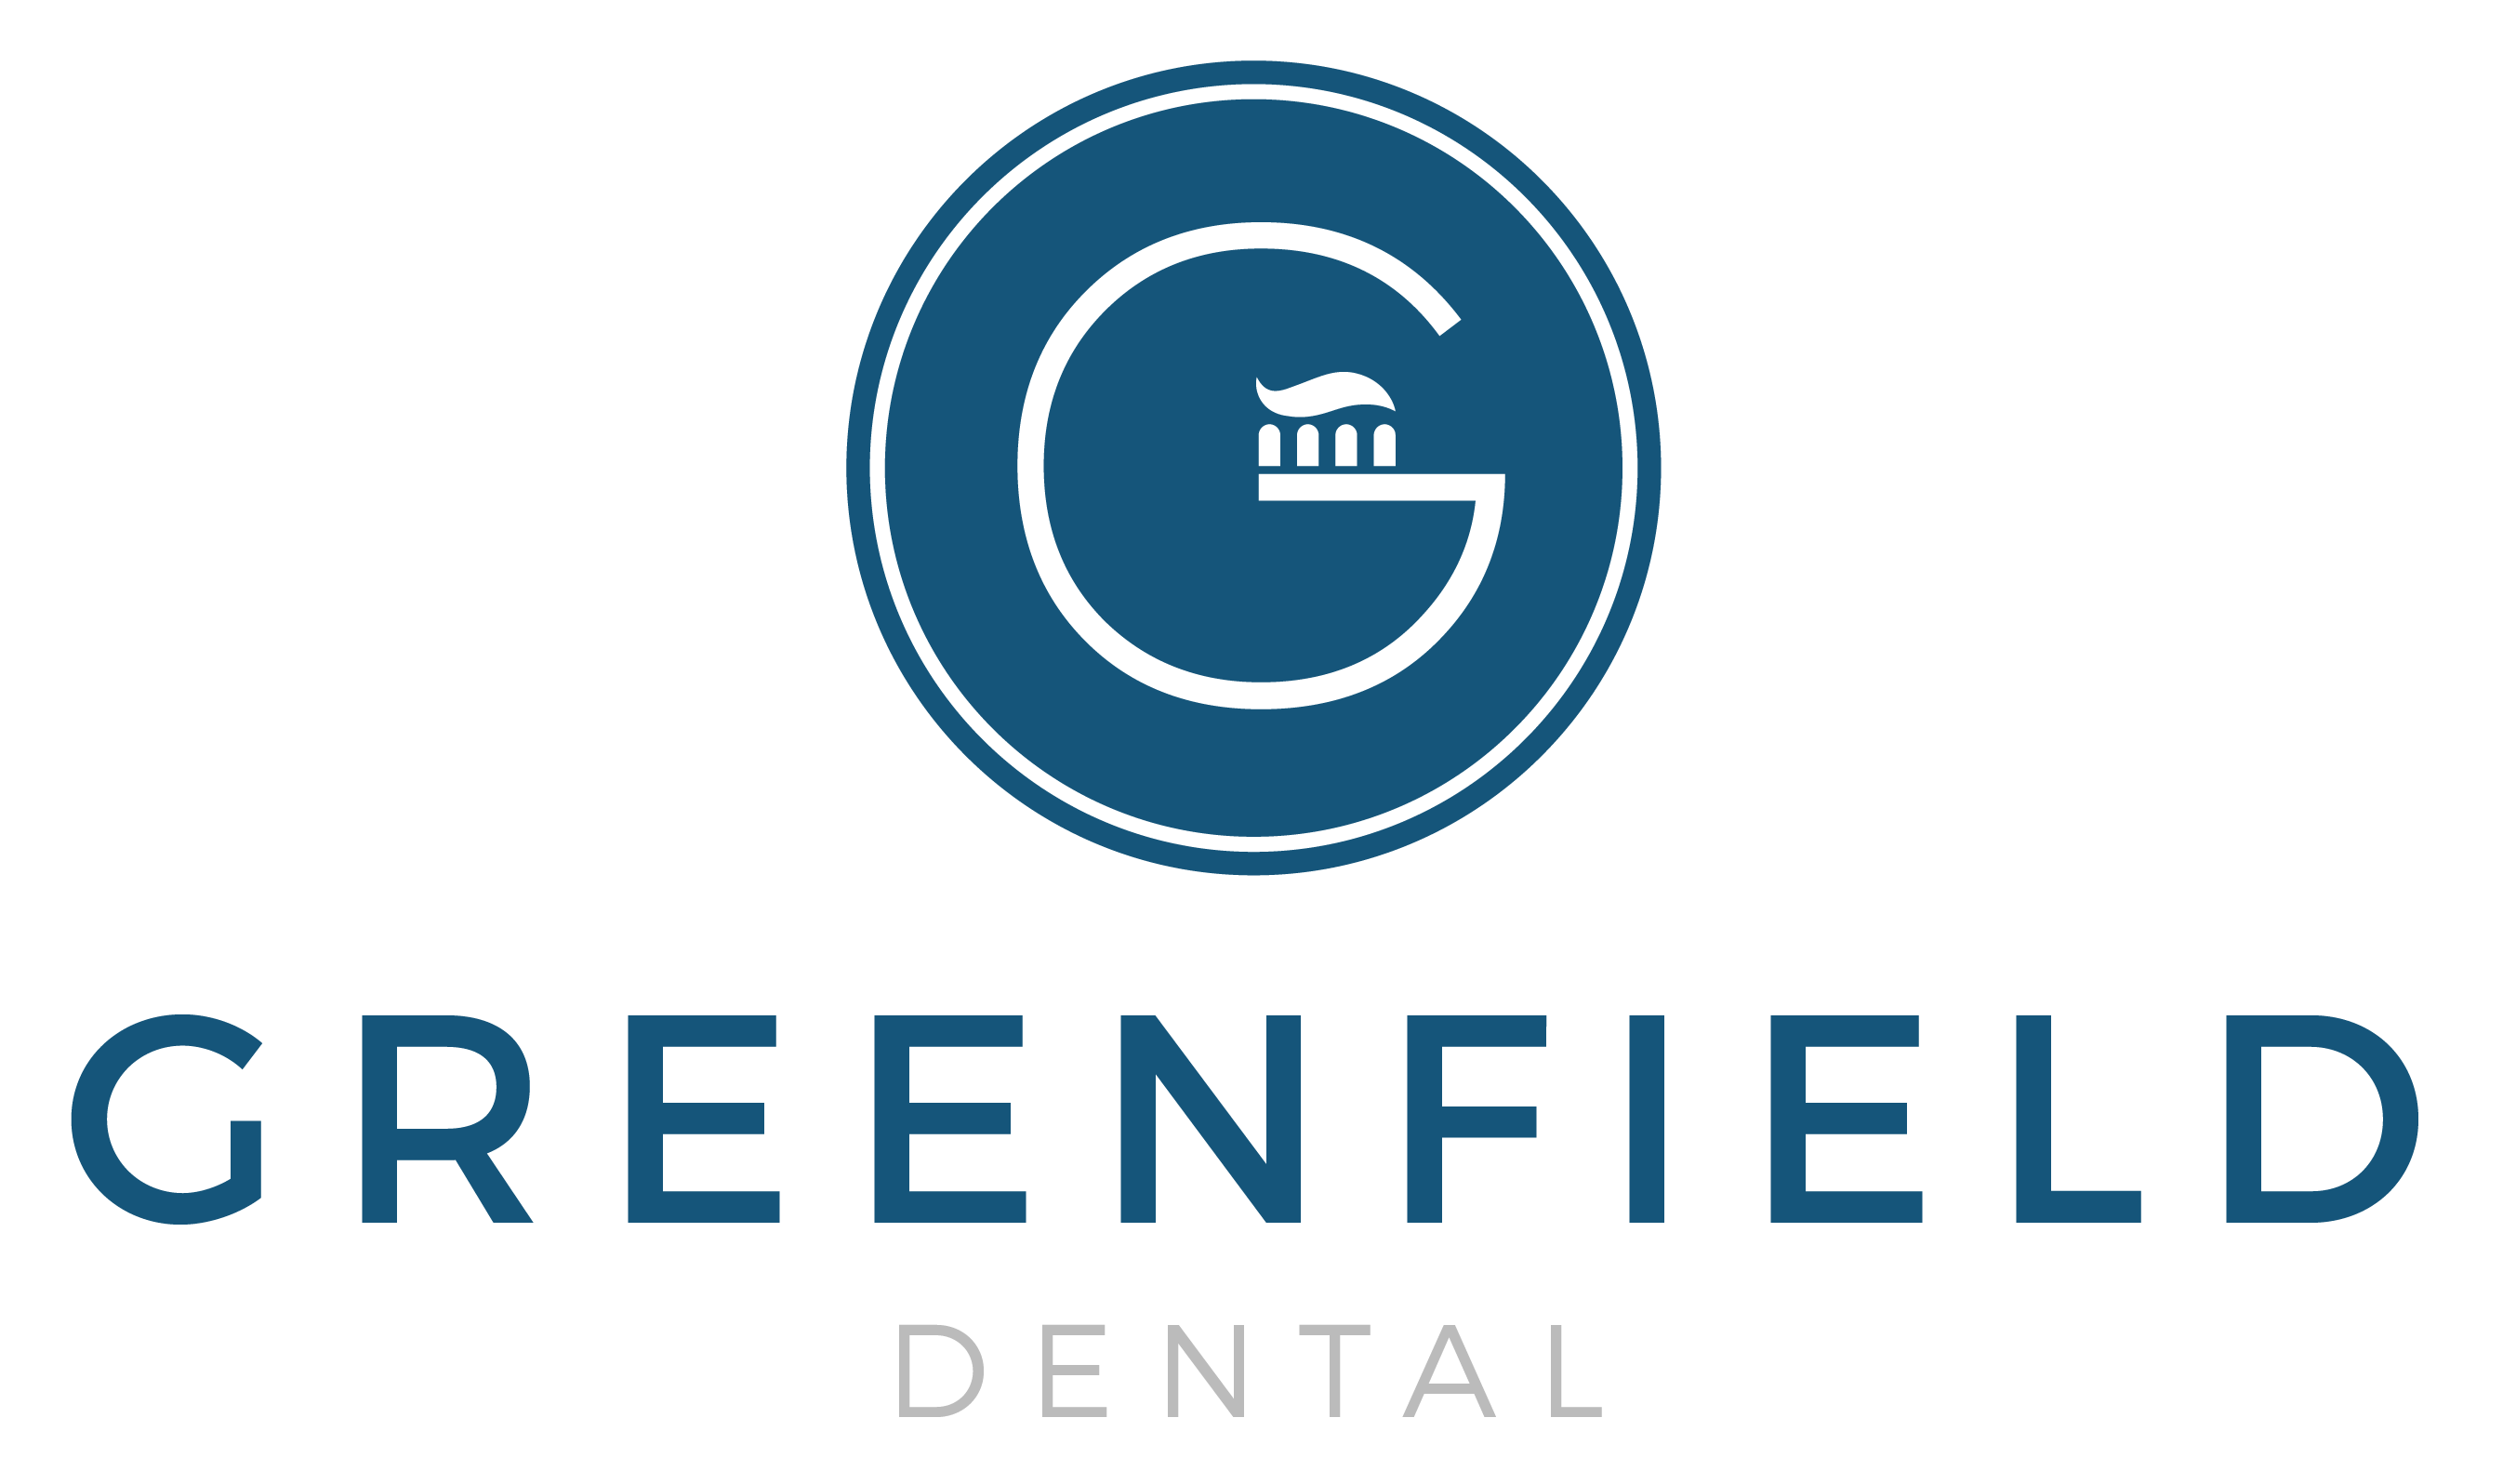 Greenfield Dental